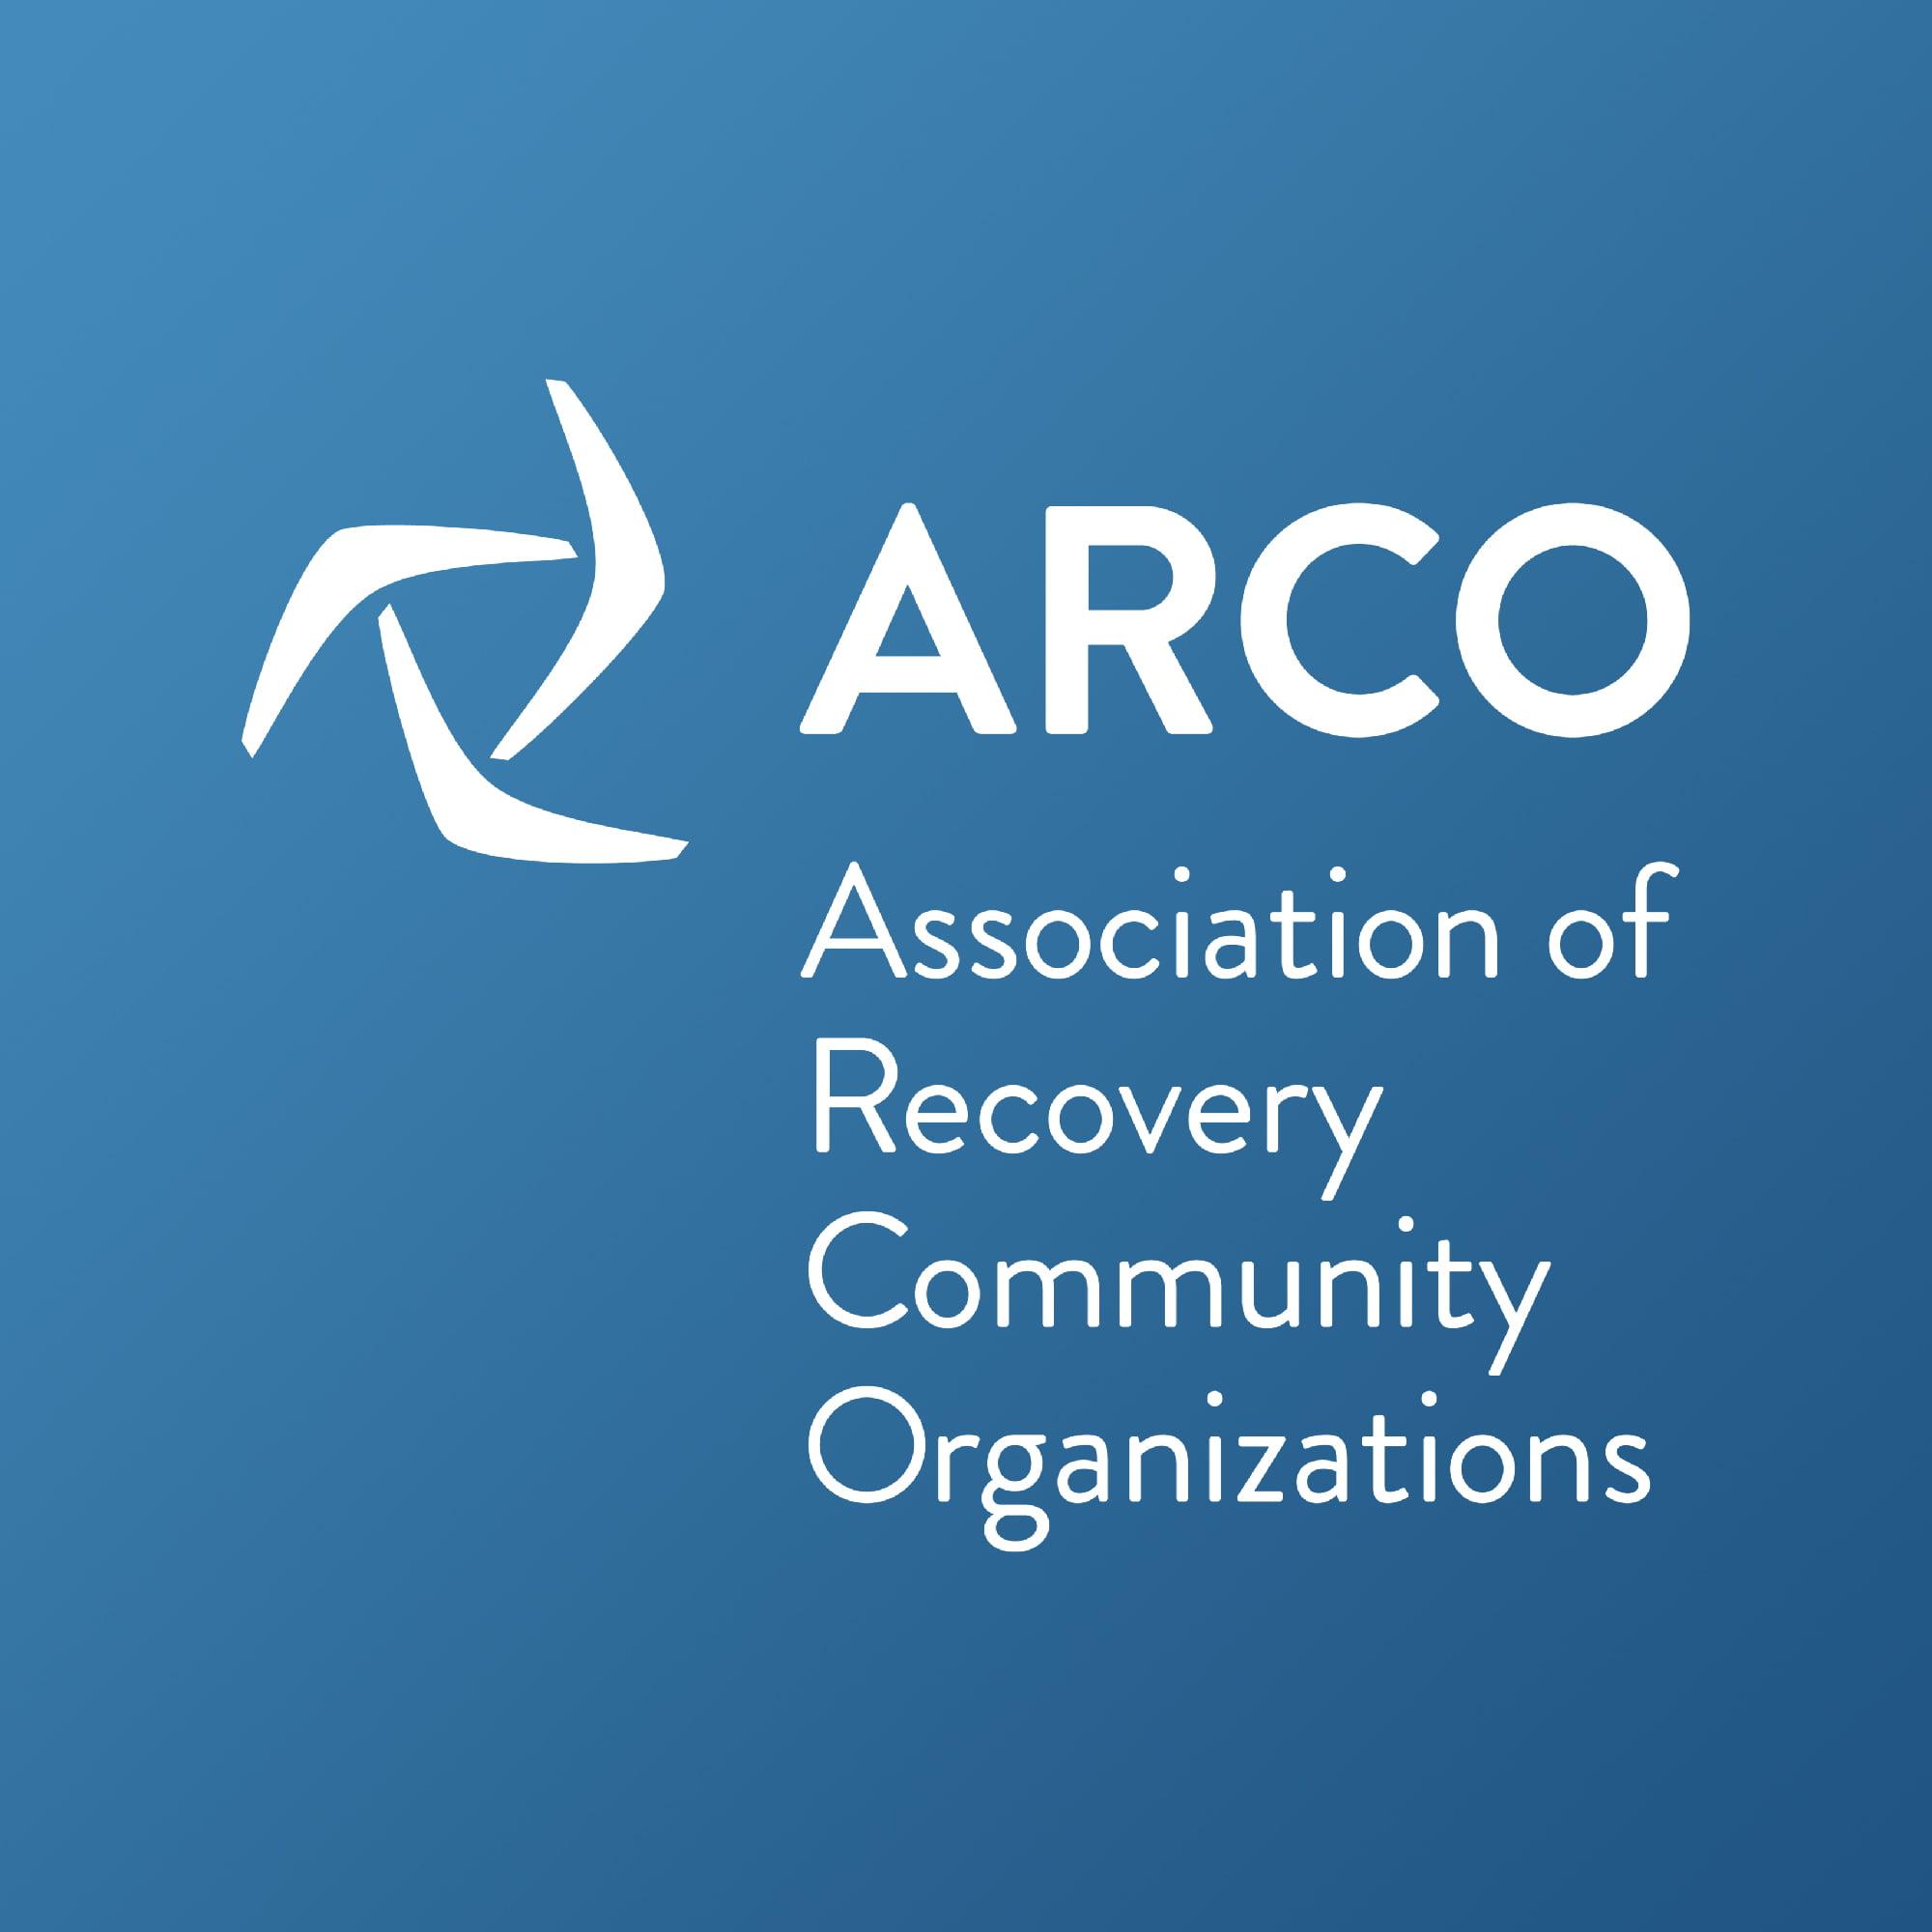 ARCO-sq-1500w